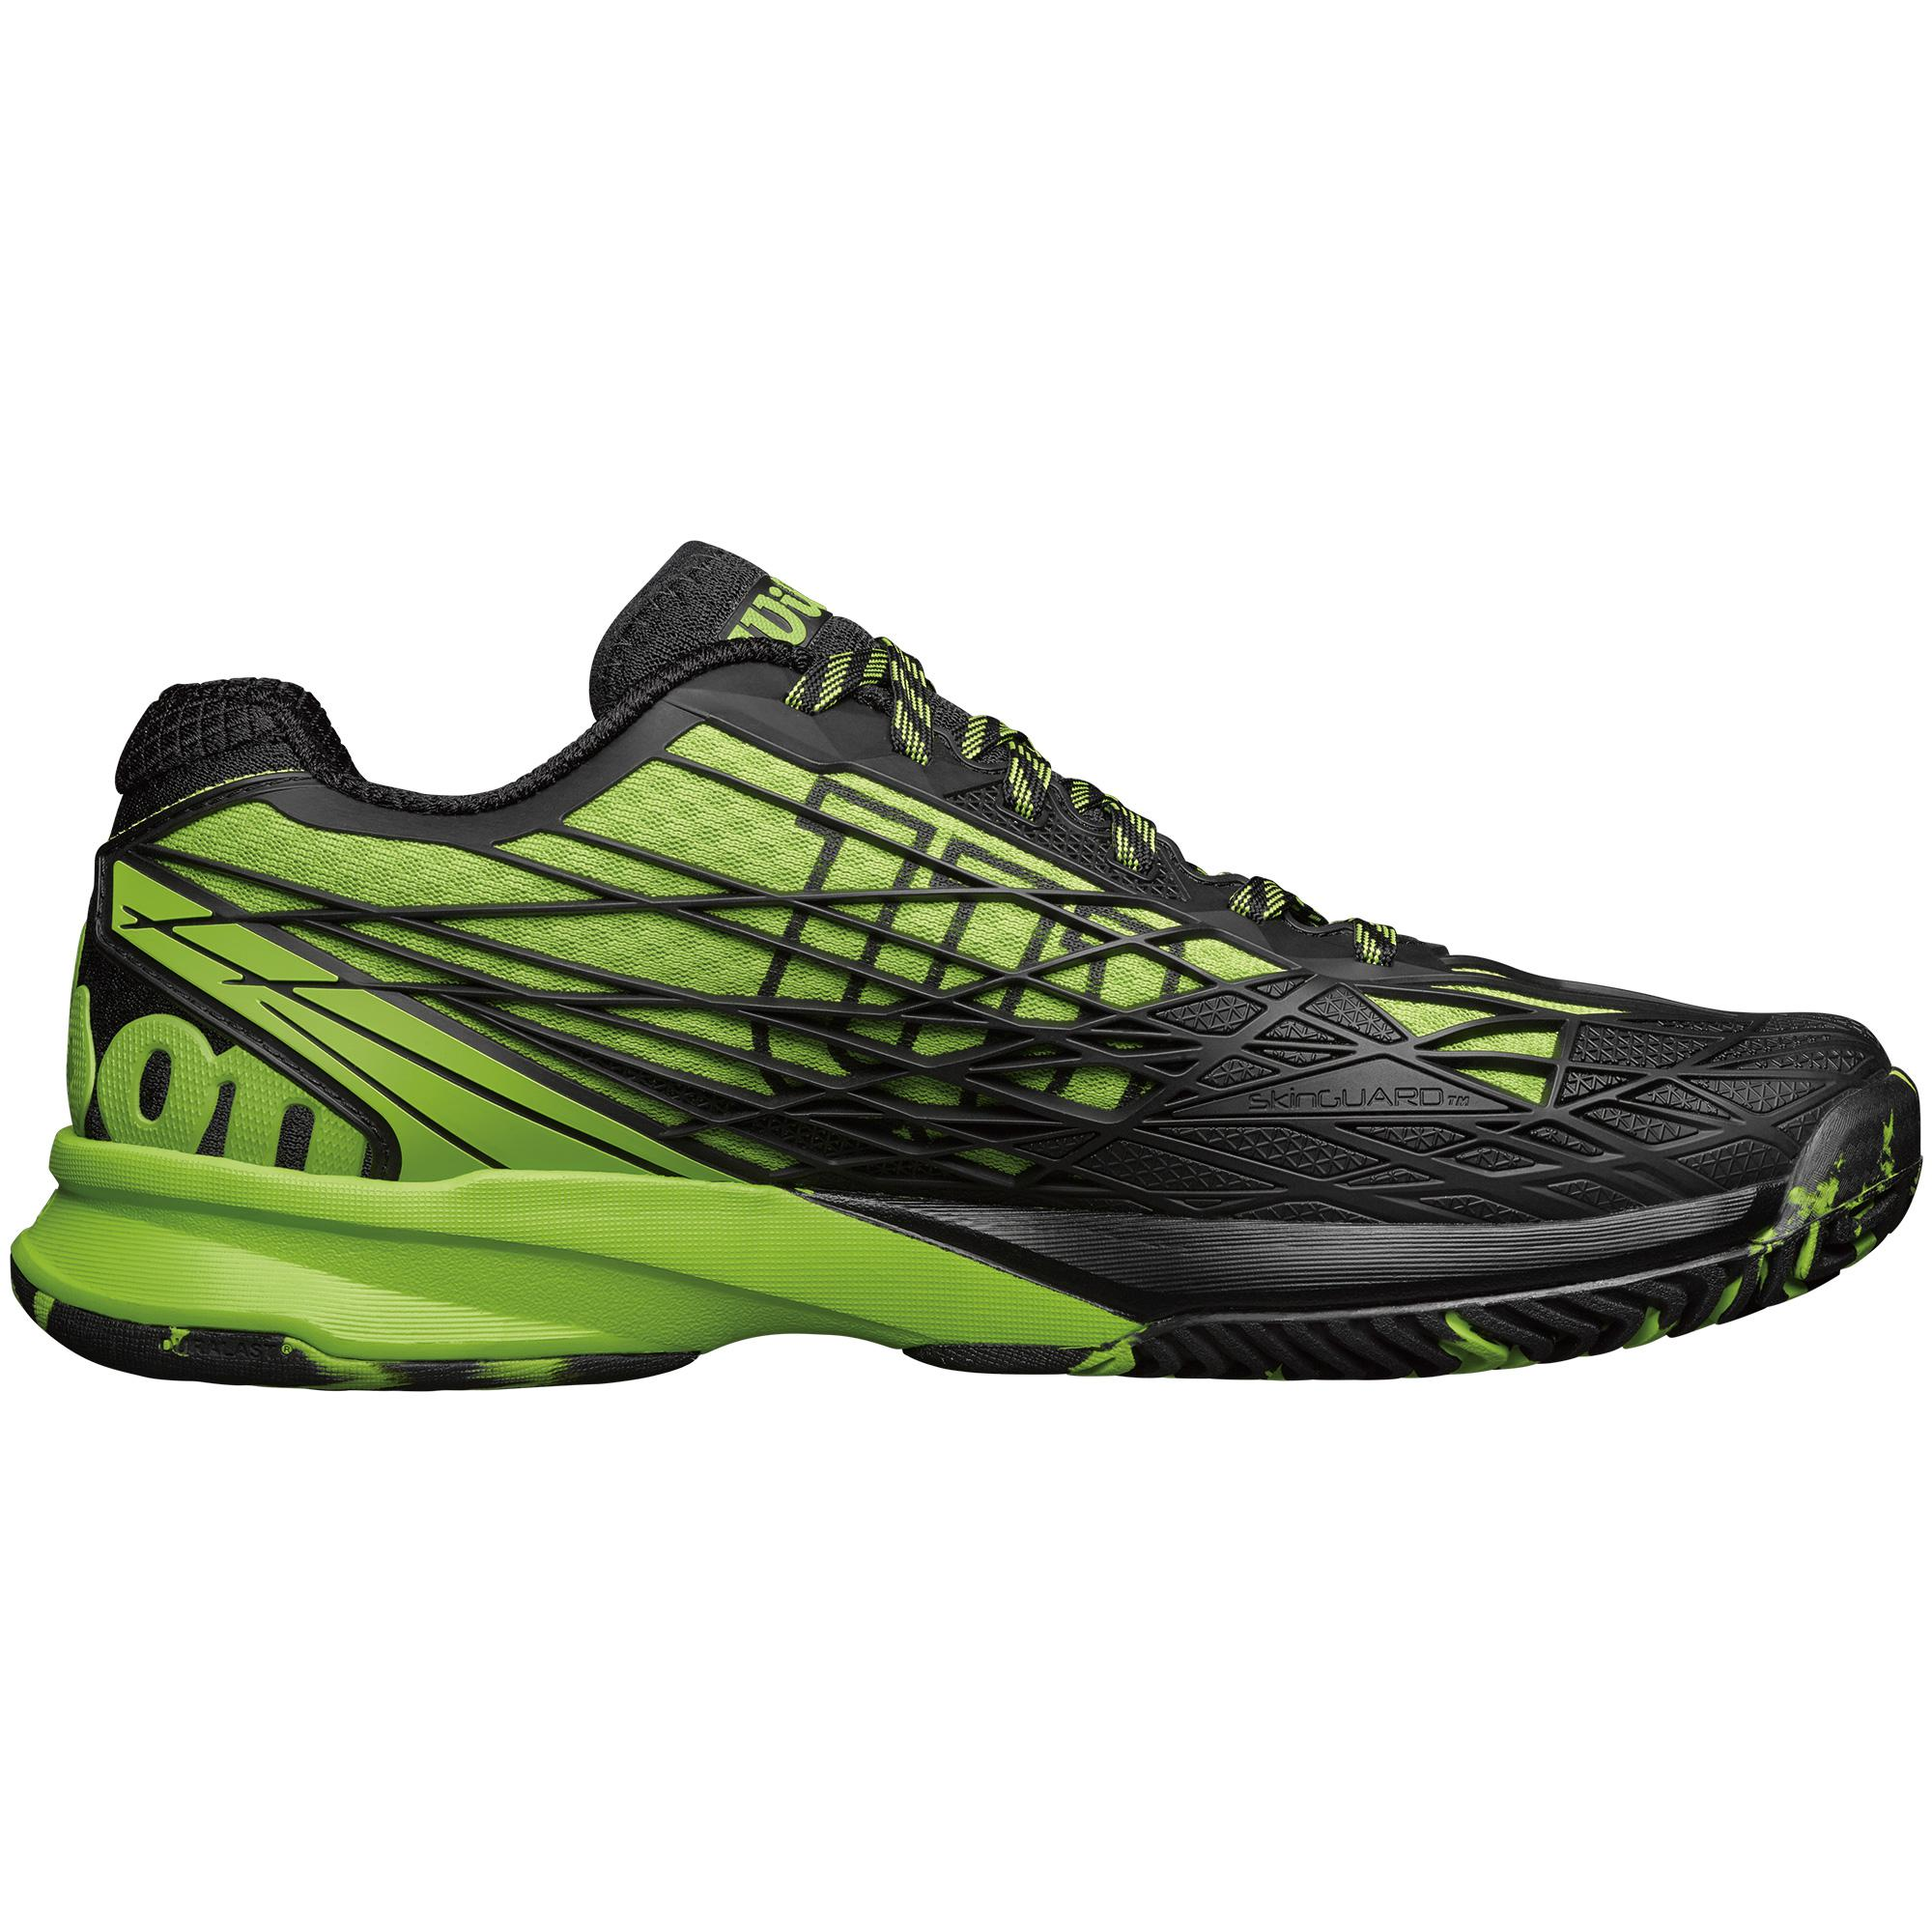 WRS325150 Wilson Mens KAOS 2.0 Tennis Shoes Brand New!